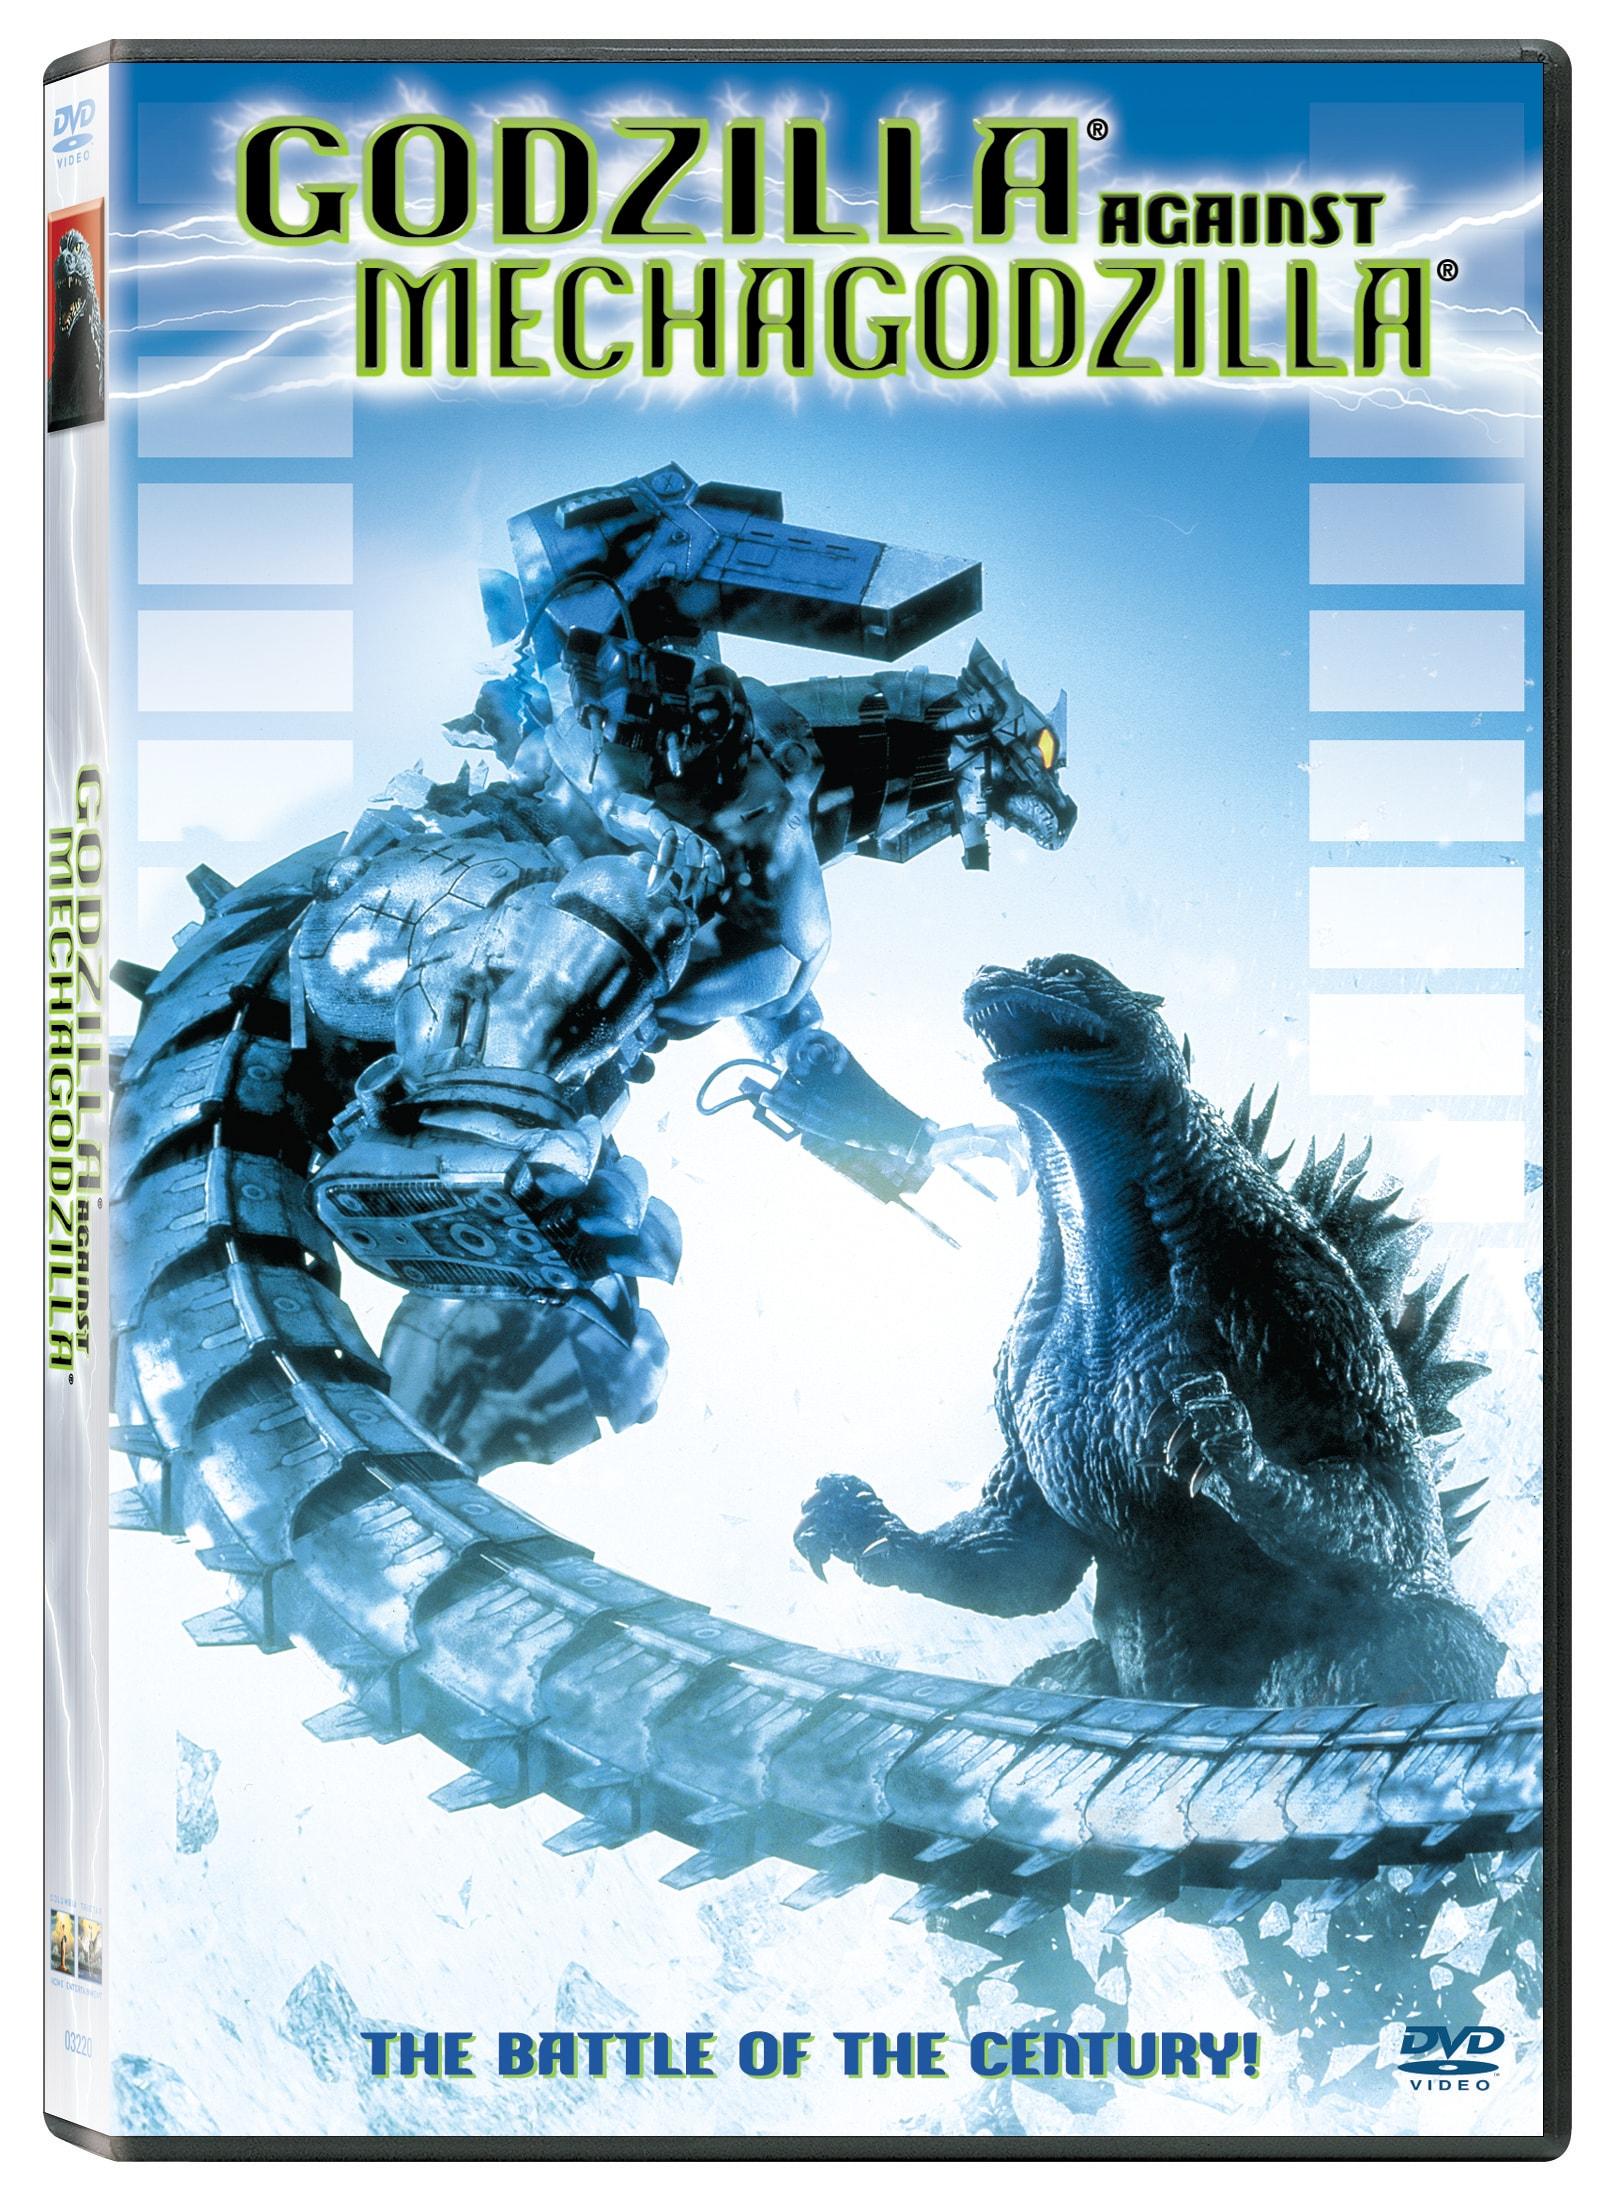 Godzilla Against Mechagodzilla (DVD)